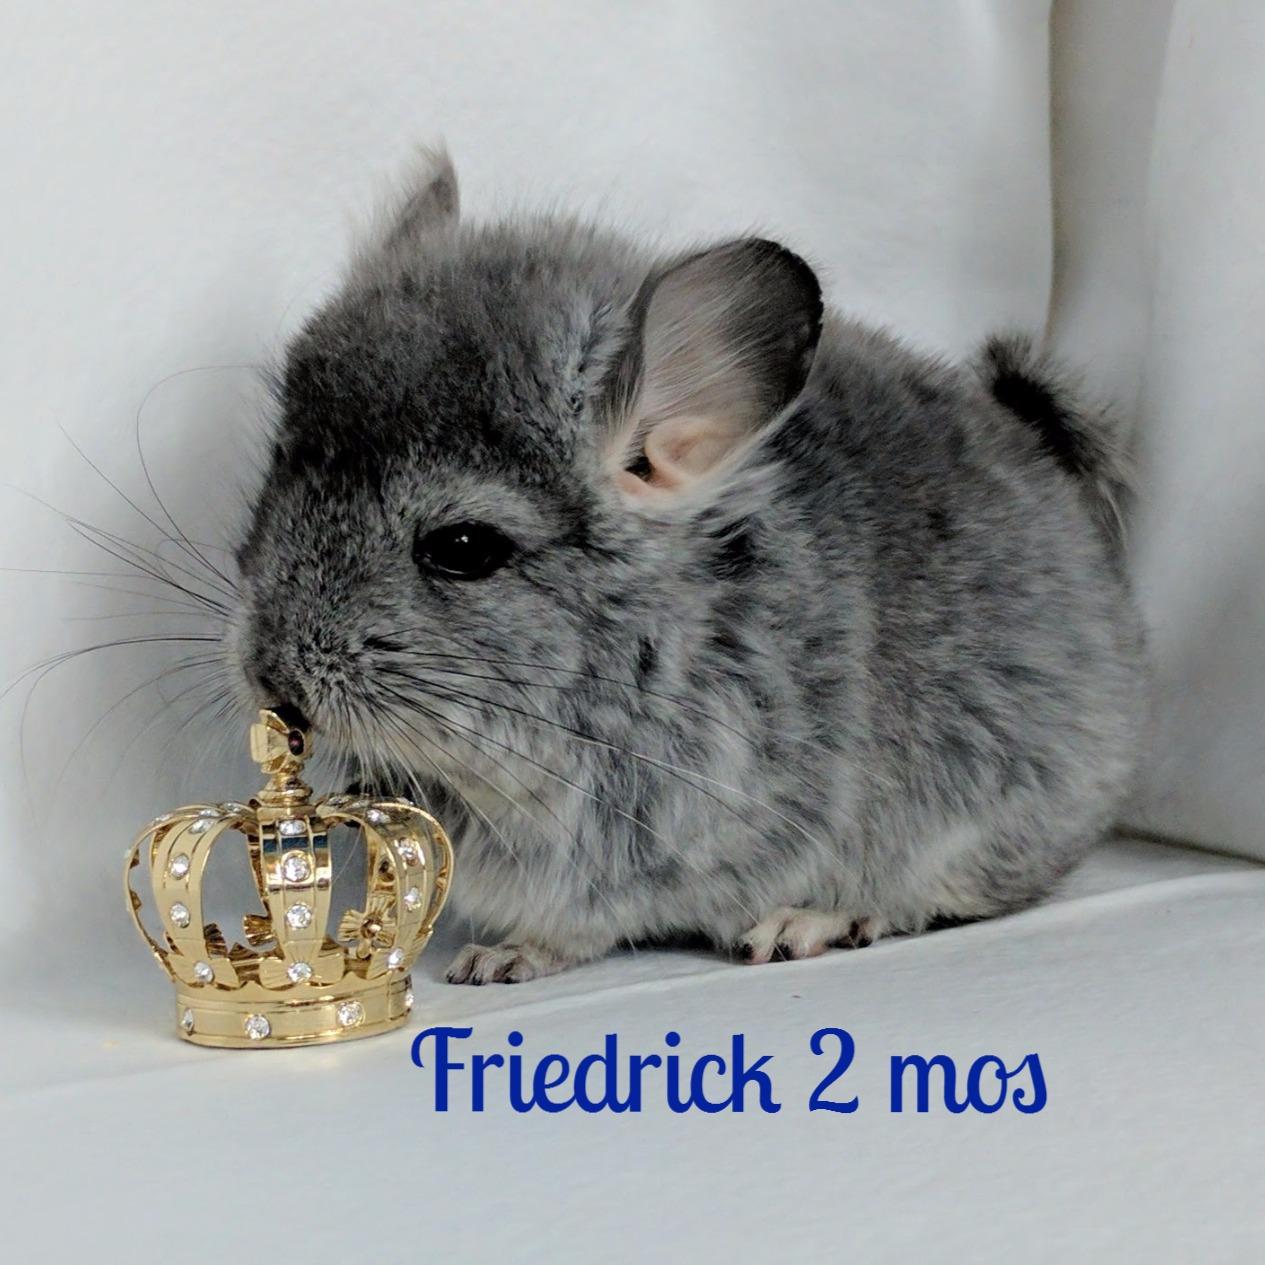 Friedrick 2 mos